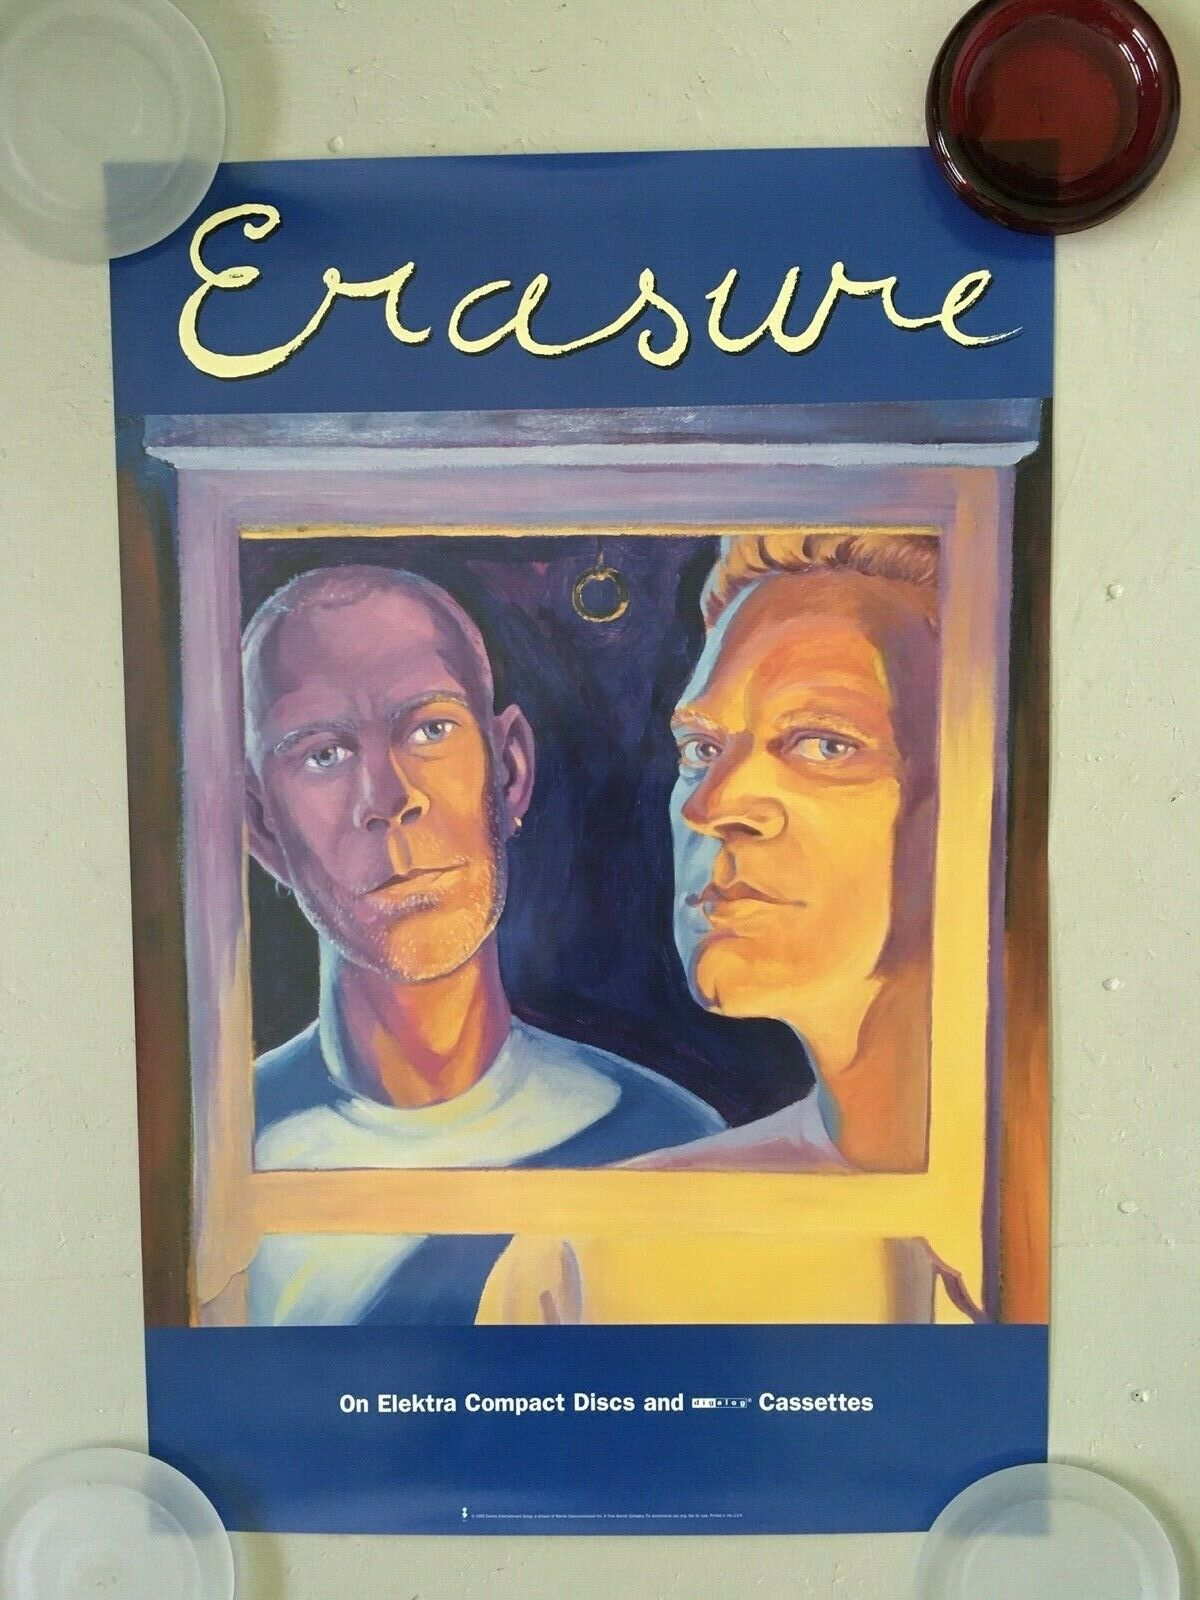 ERASURE - Erasure - 95 Promo Poster - 20x30 - USA  - $29.99